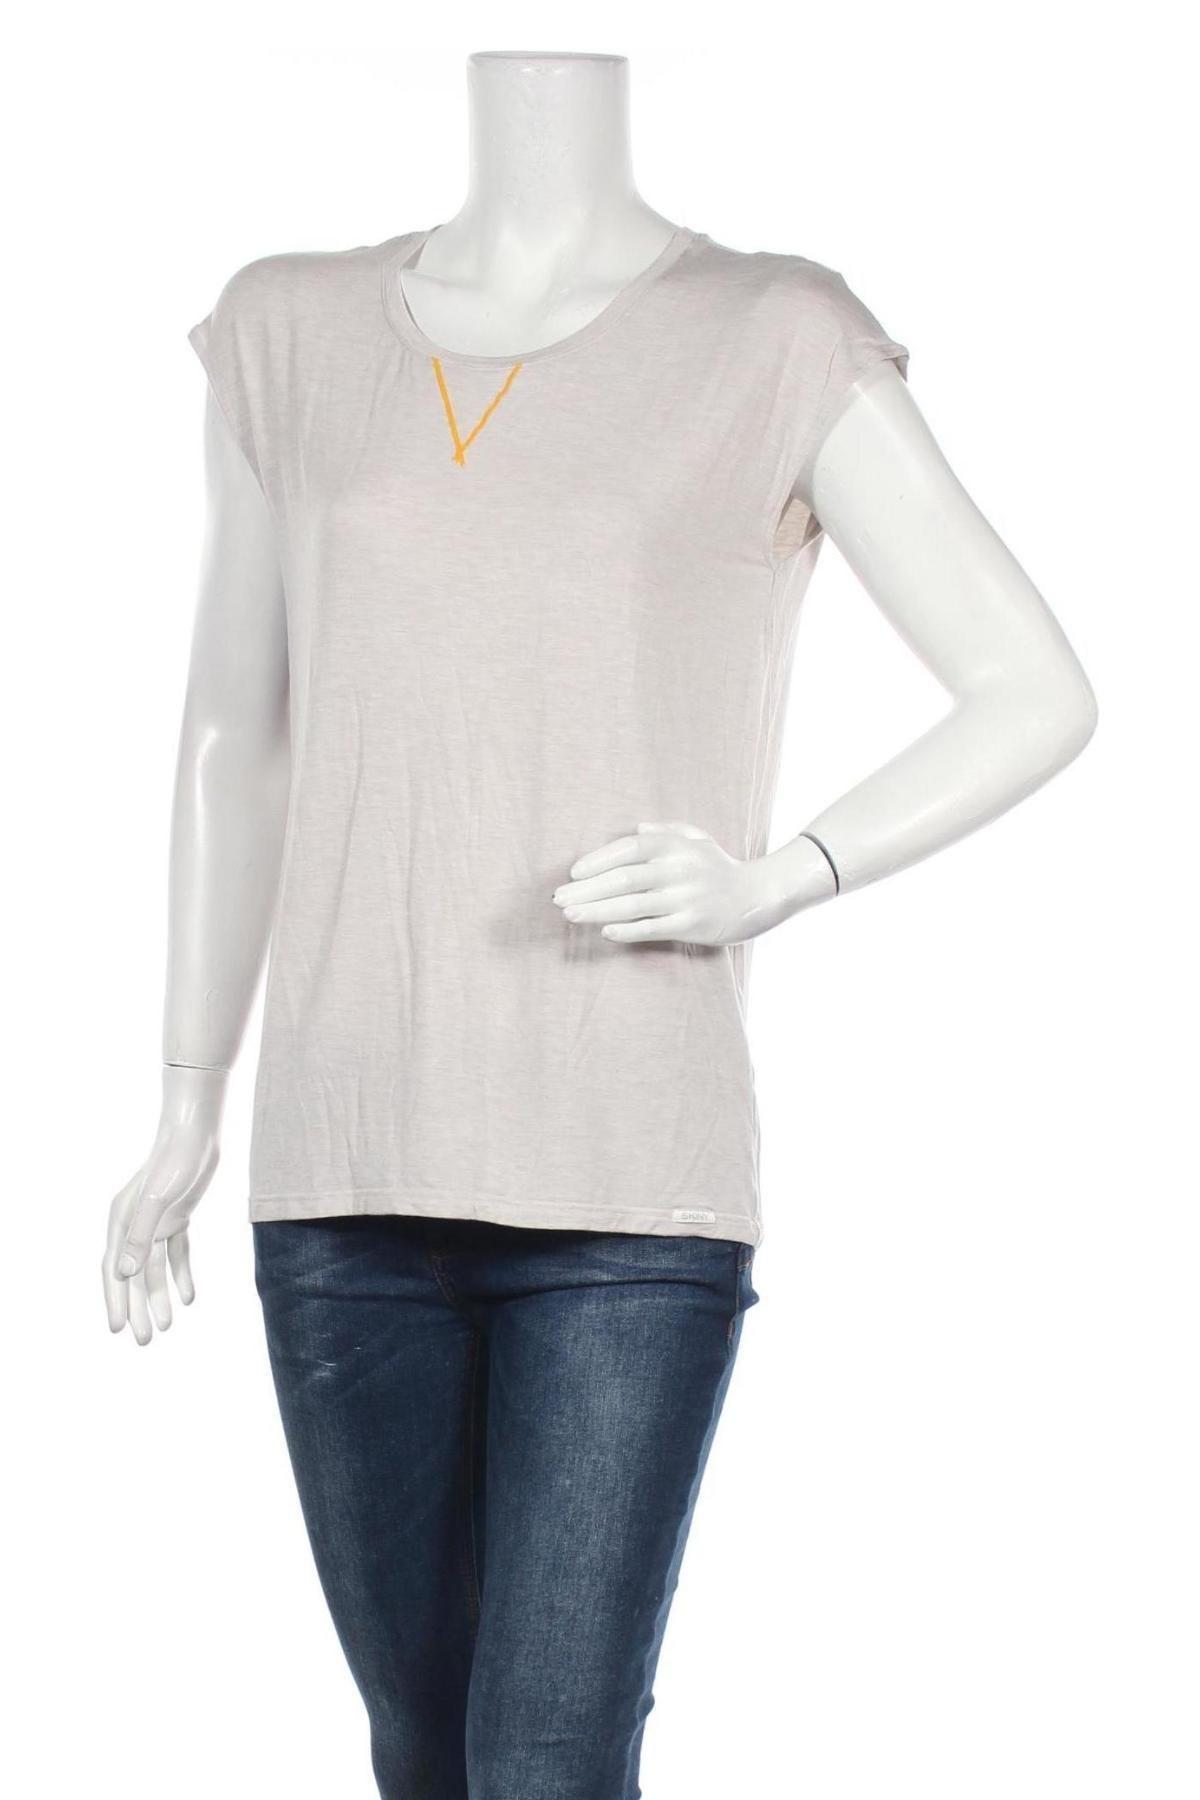 Пижама Skiny, Размер M, Цвят Сив, 95% модал, 5% еластан, Цена 27,30лв.